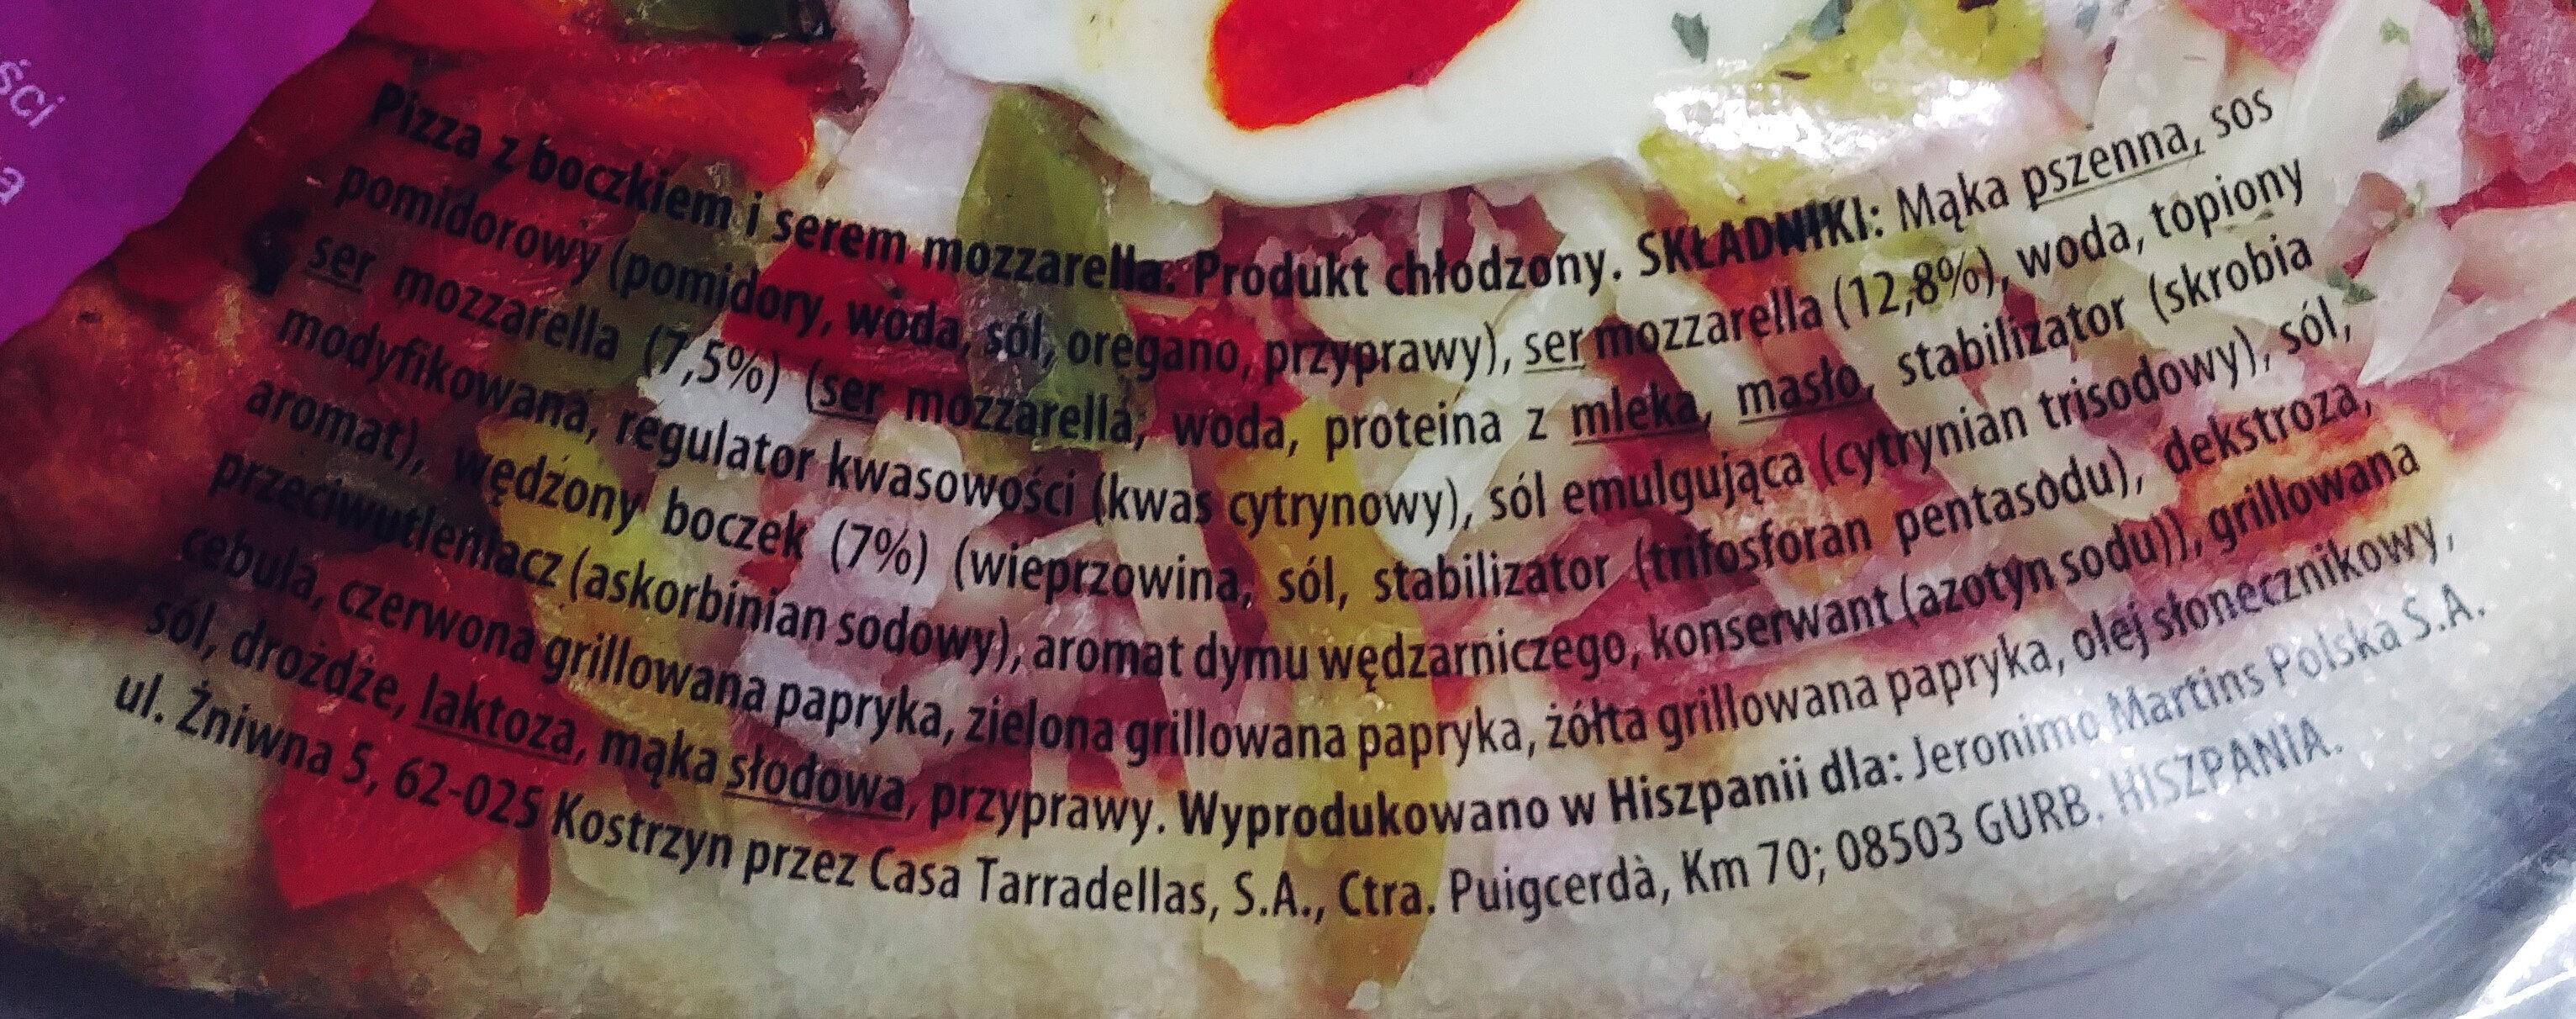 Pizza z boczkiem i serem mozzarella - Ingrediënten - pl